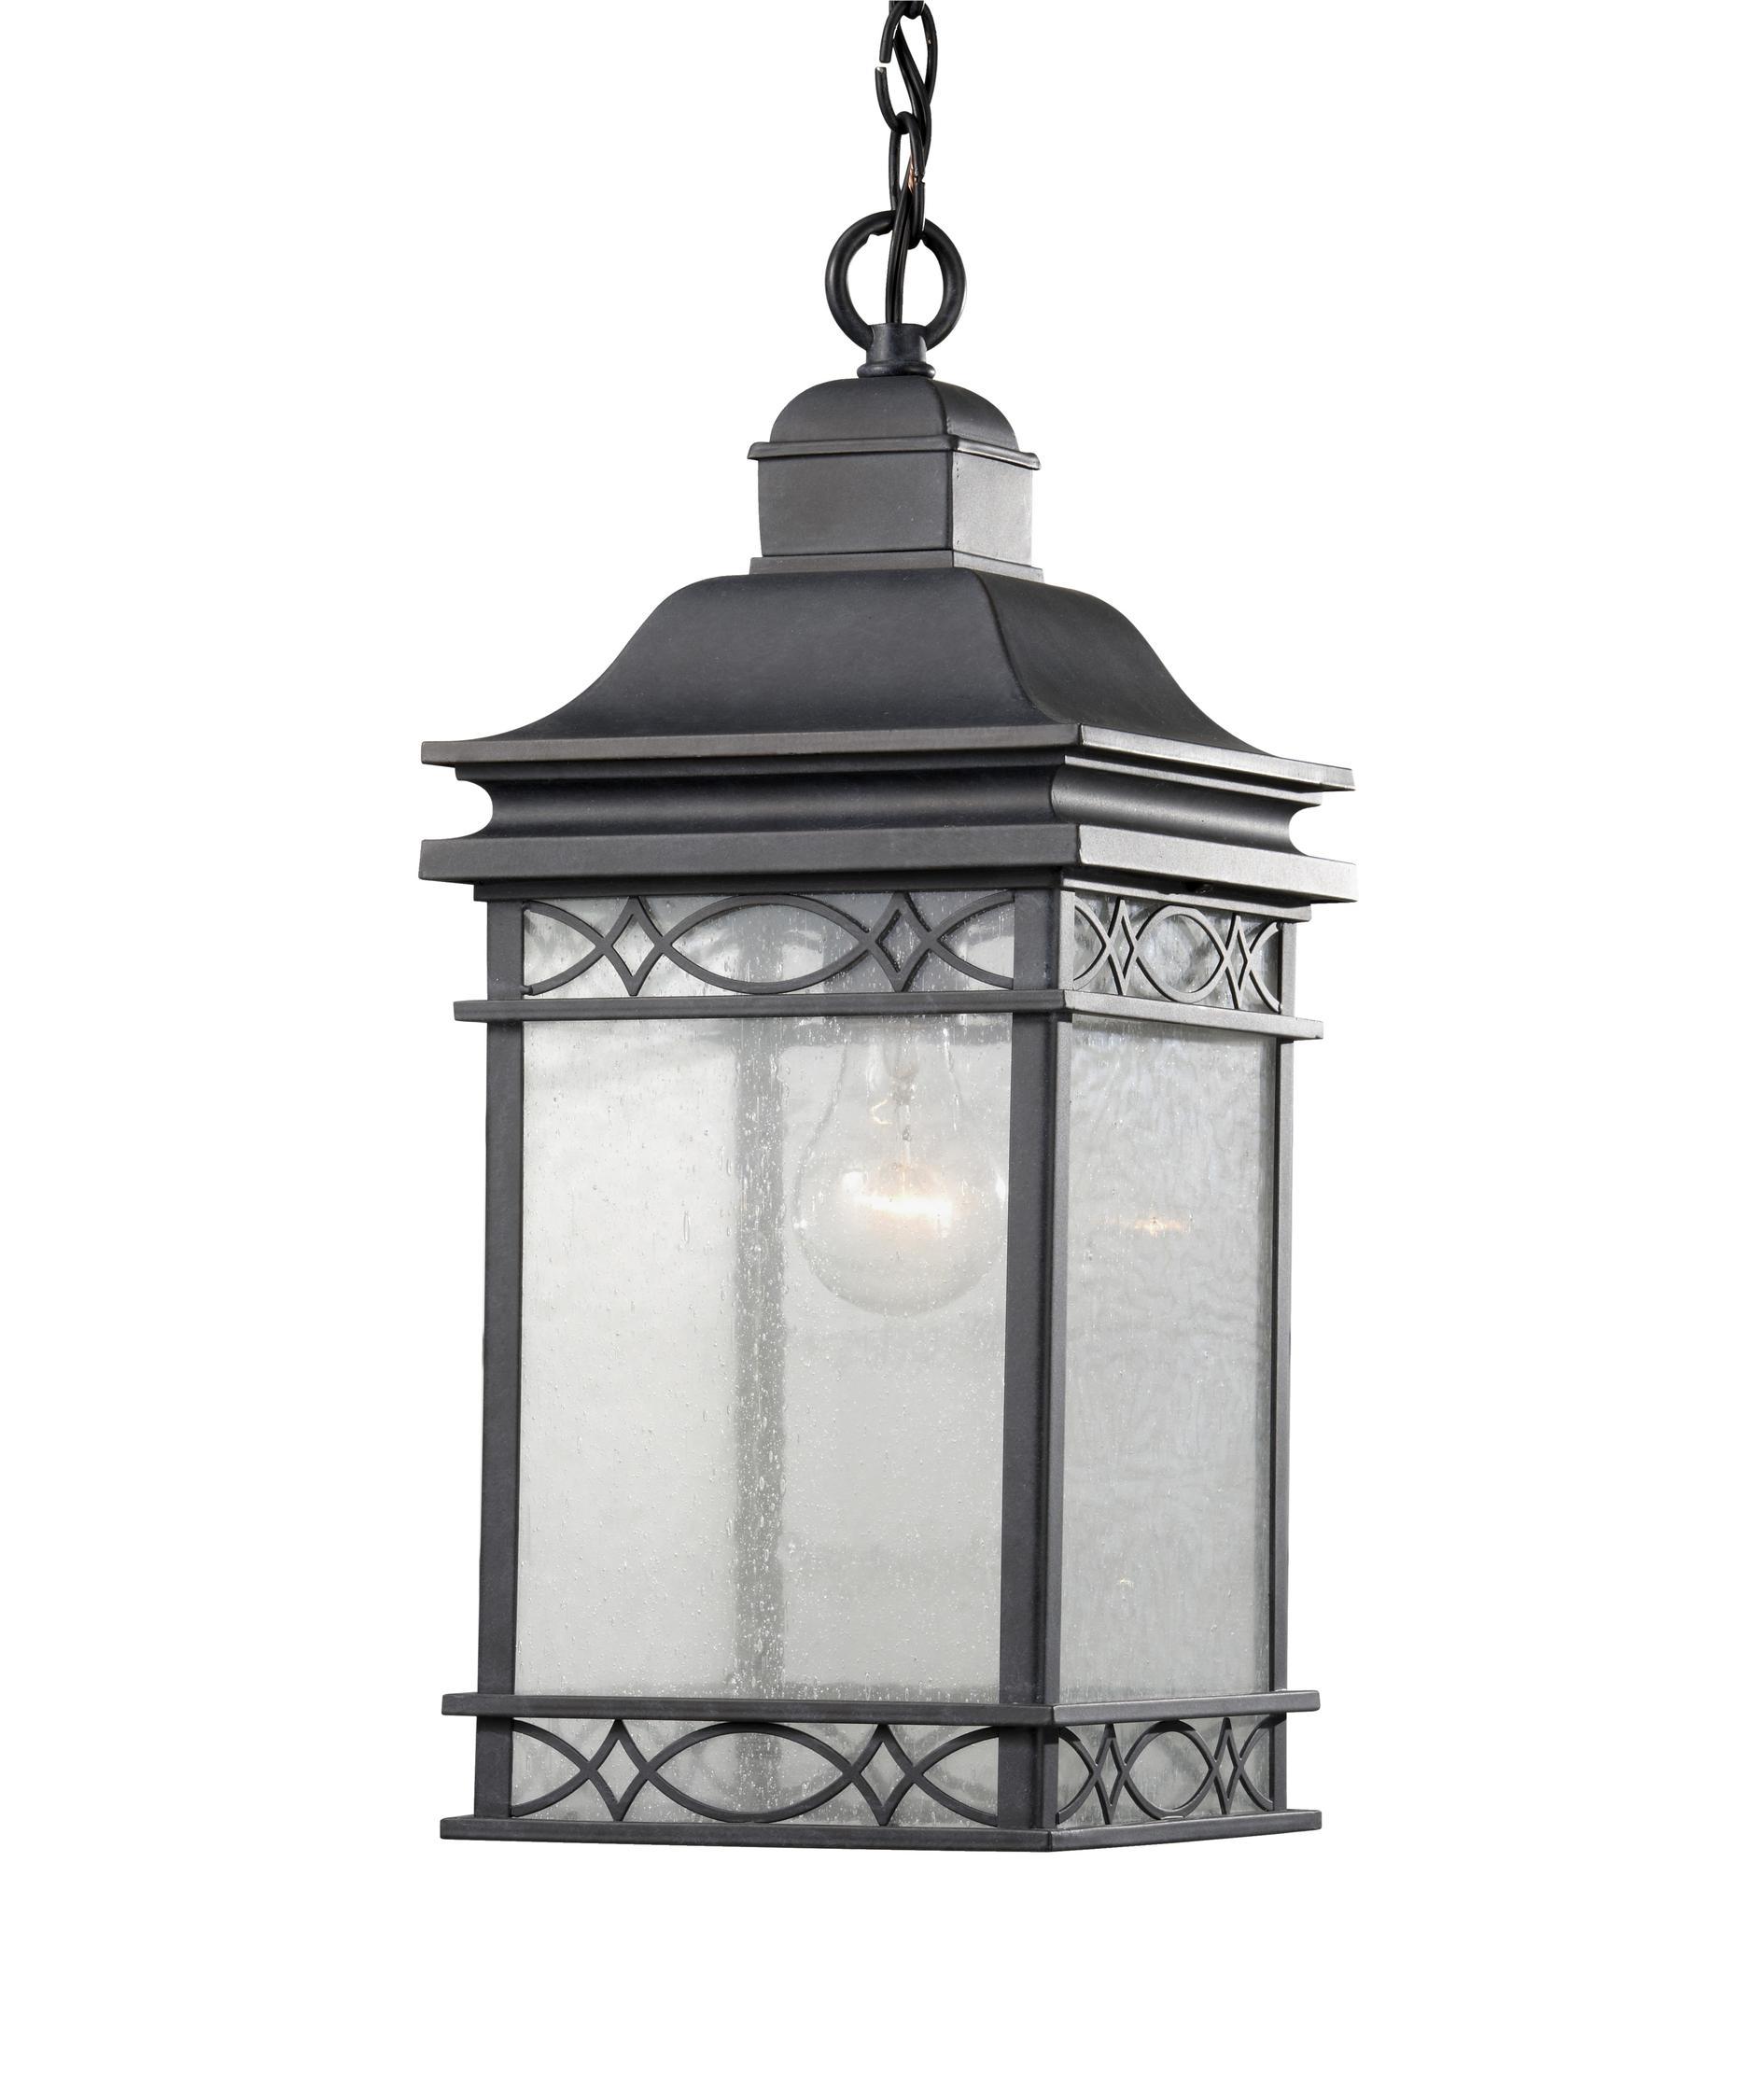 Murray Feiss Outdoor Lighting: Murray Feiss OL8011 Liberty 1 Light Outdoor Hanging